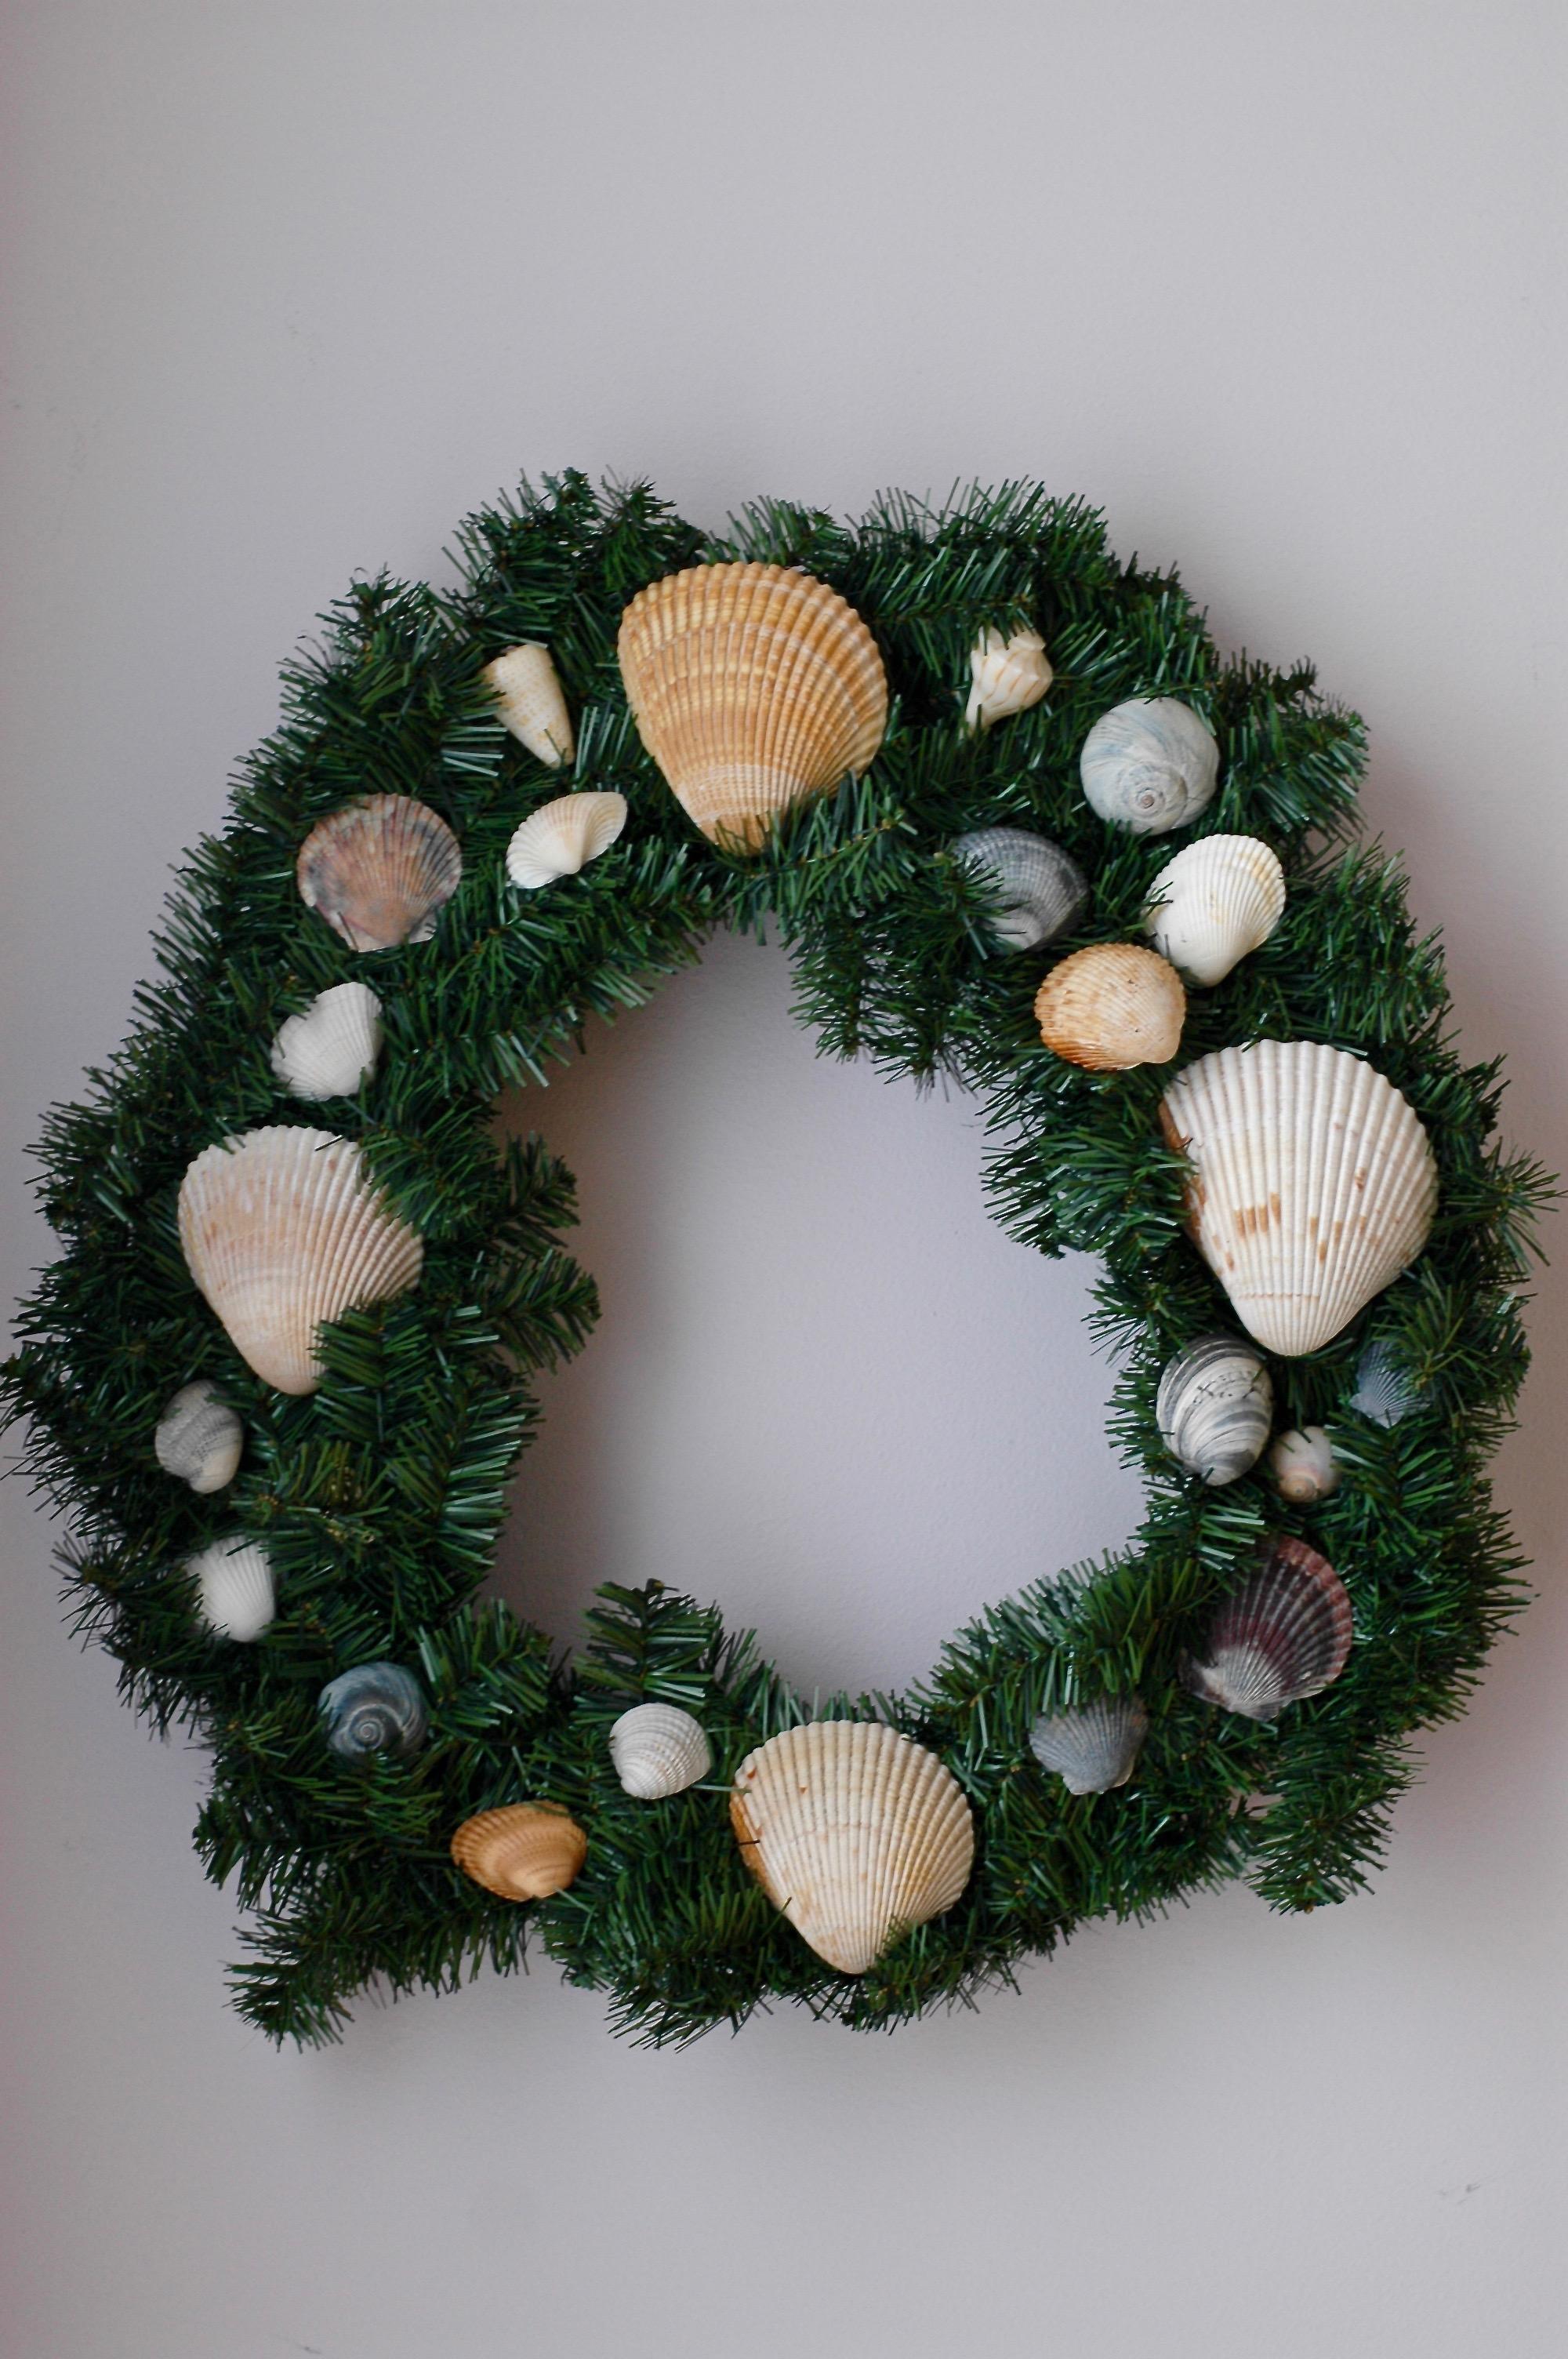 D.I.Y. Seashell Wreath